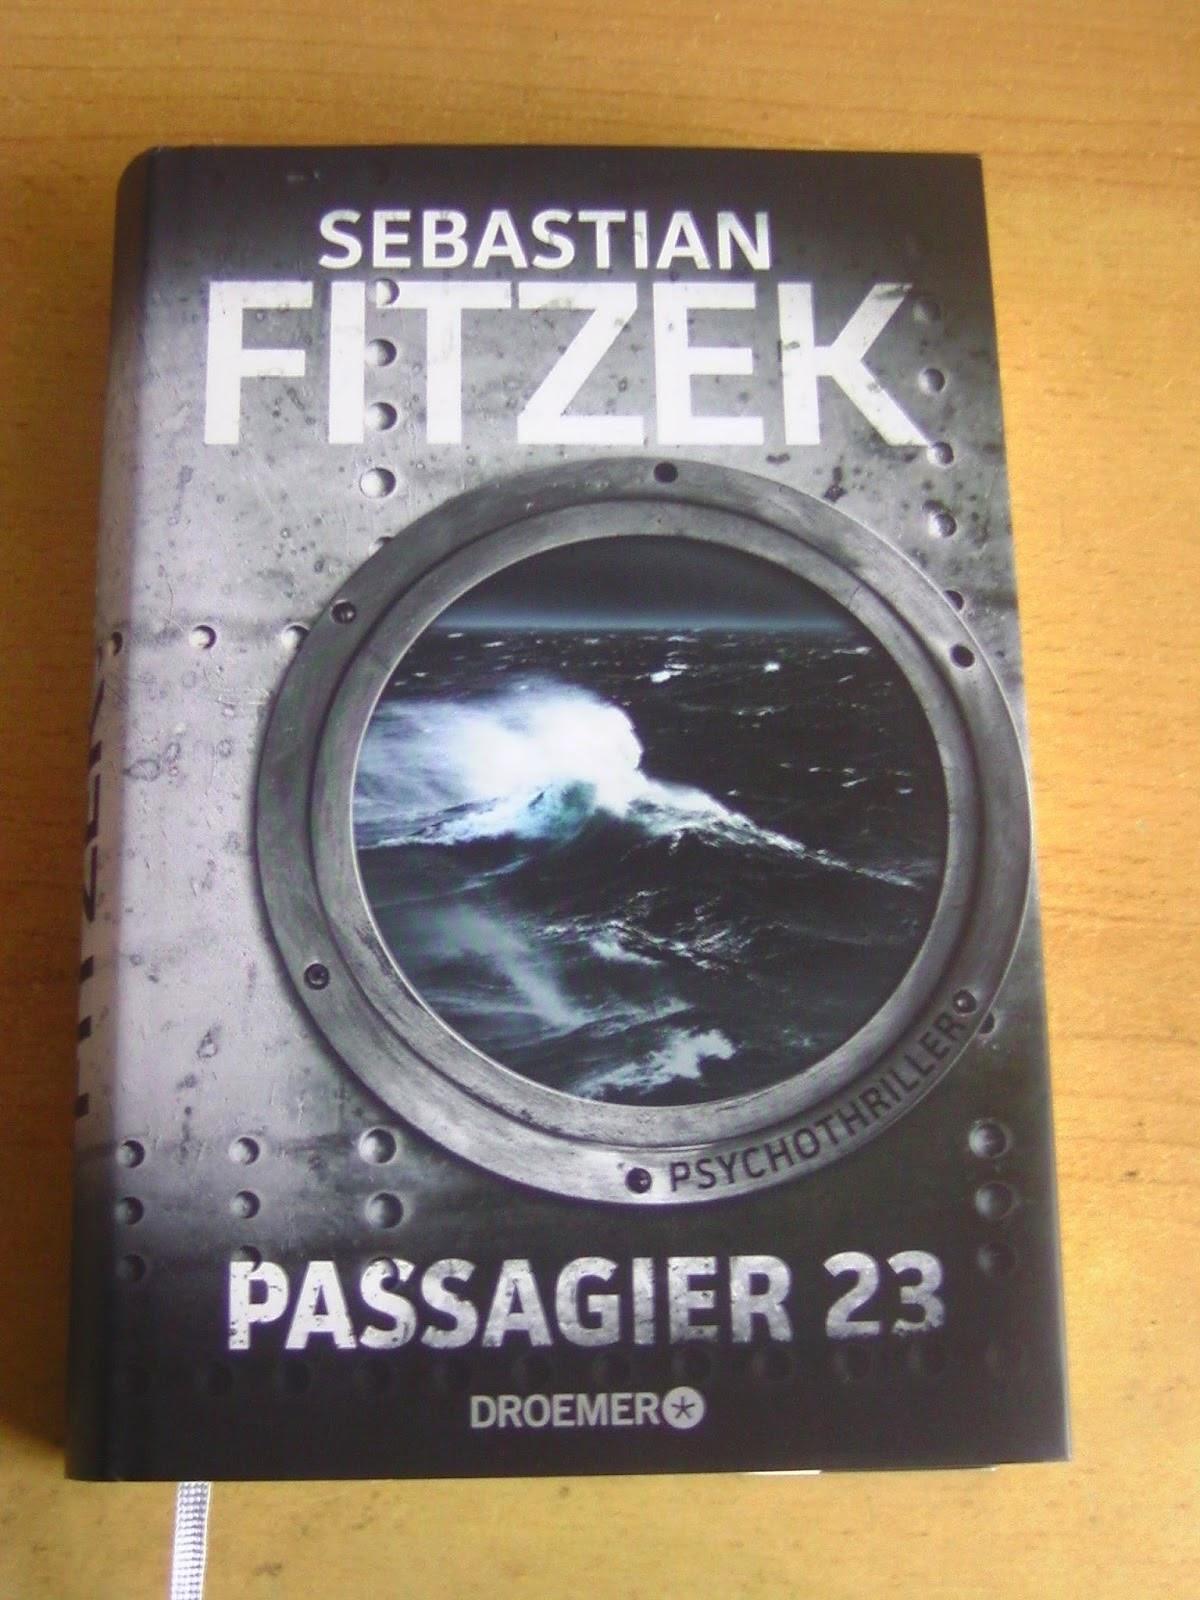 http://www.amazon.de/Passagier-23-Psychothriller-Sebastian-Fitzek/dp/342619919X/ref=sr_1_1?s=books&ie=UTF8&qid=1429121097&sr=1-1&keywords=passagier+23